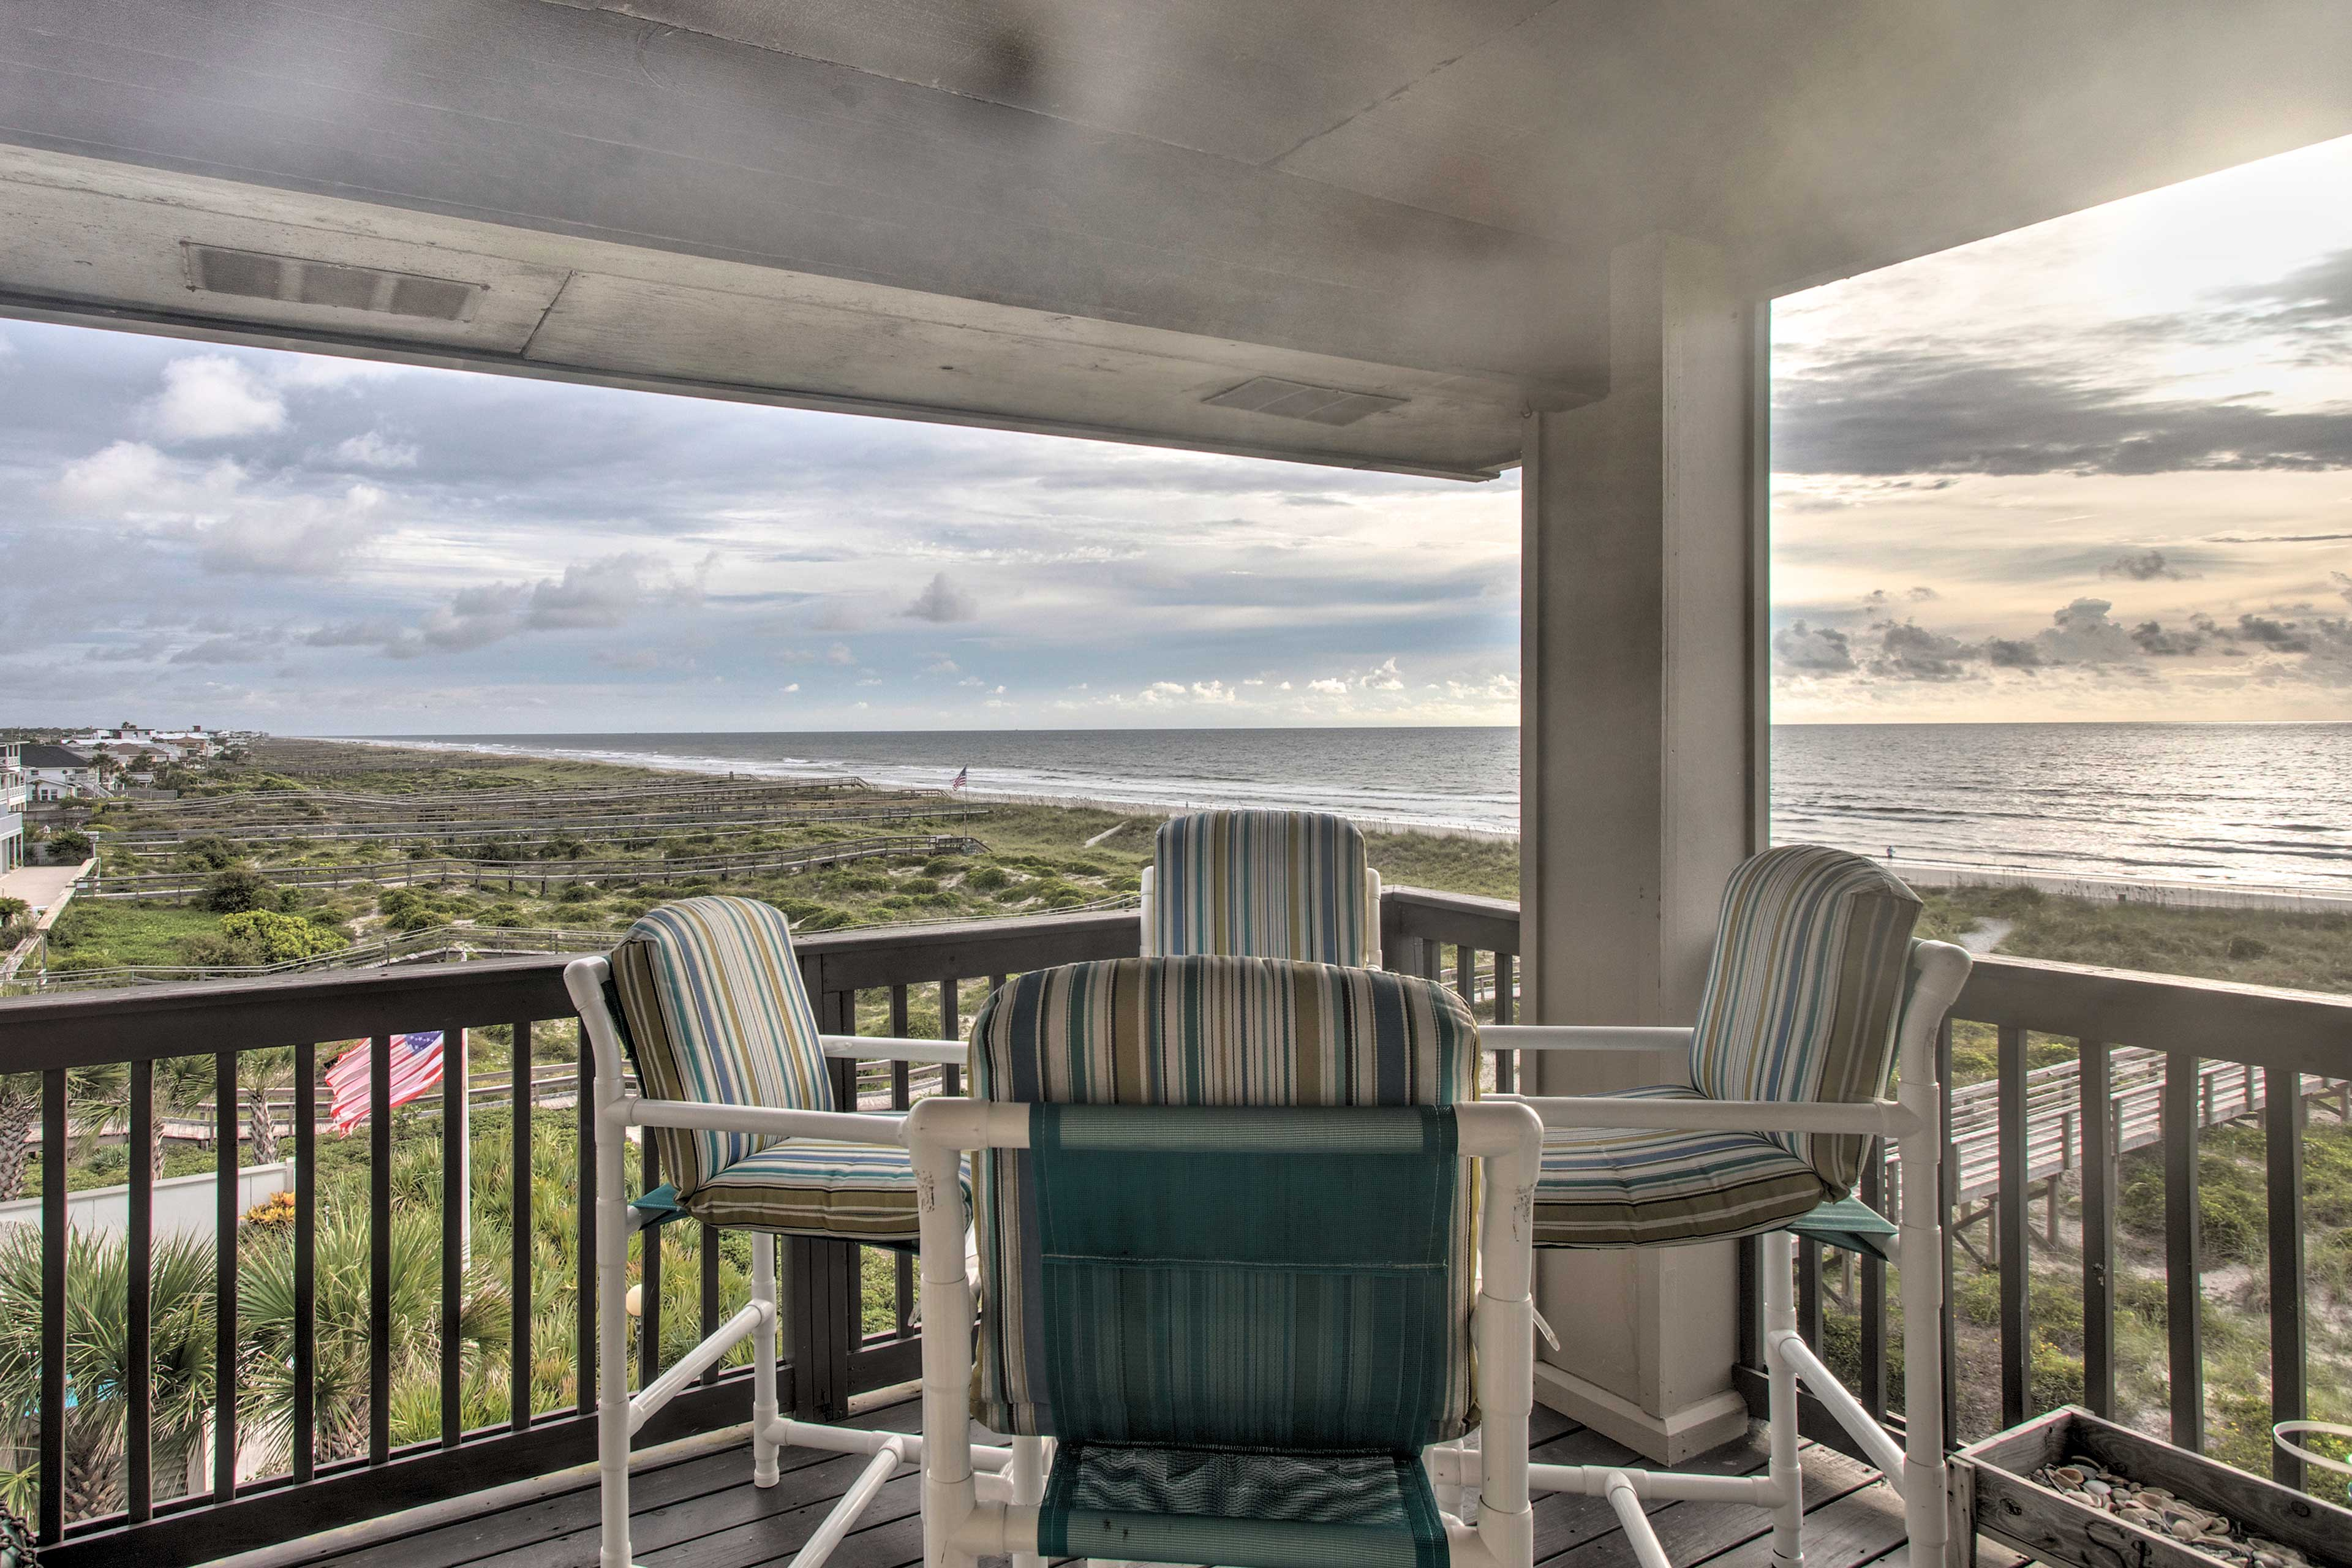 Book a trip to this  2-bedroom, 2-bath vacation rental villa in Fernandina Beach